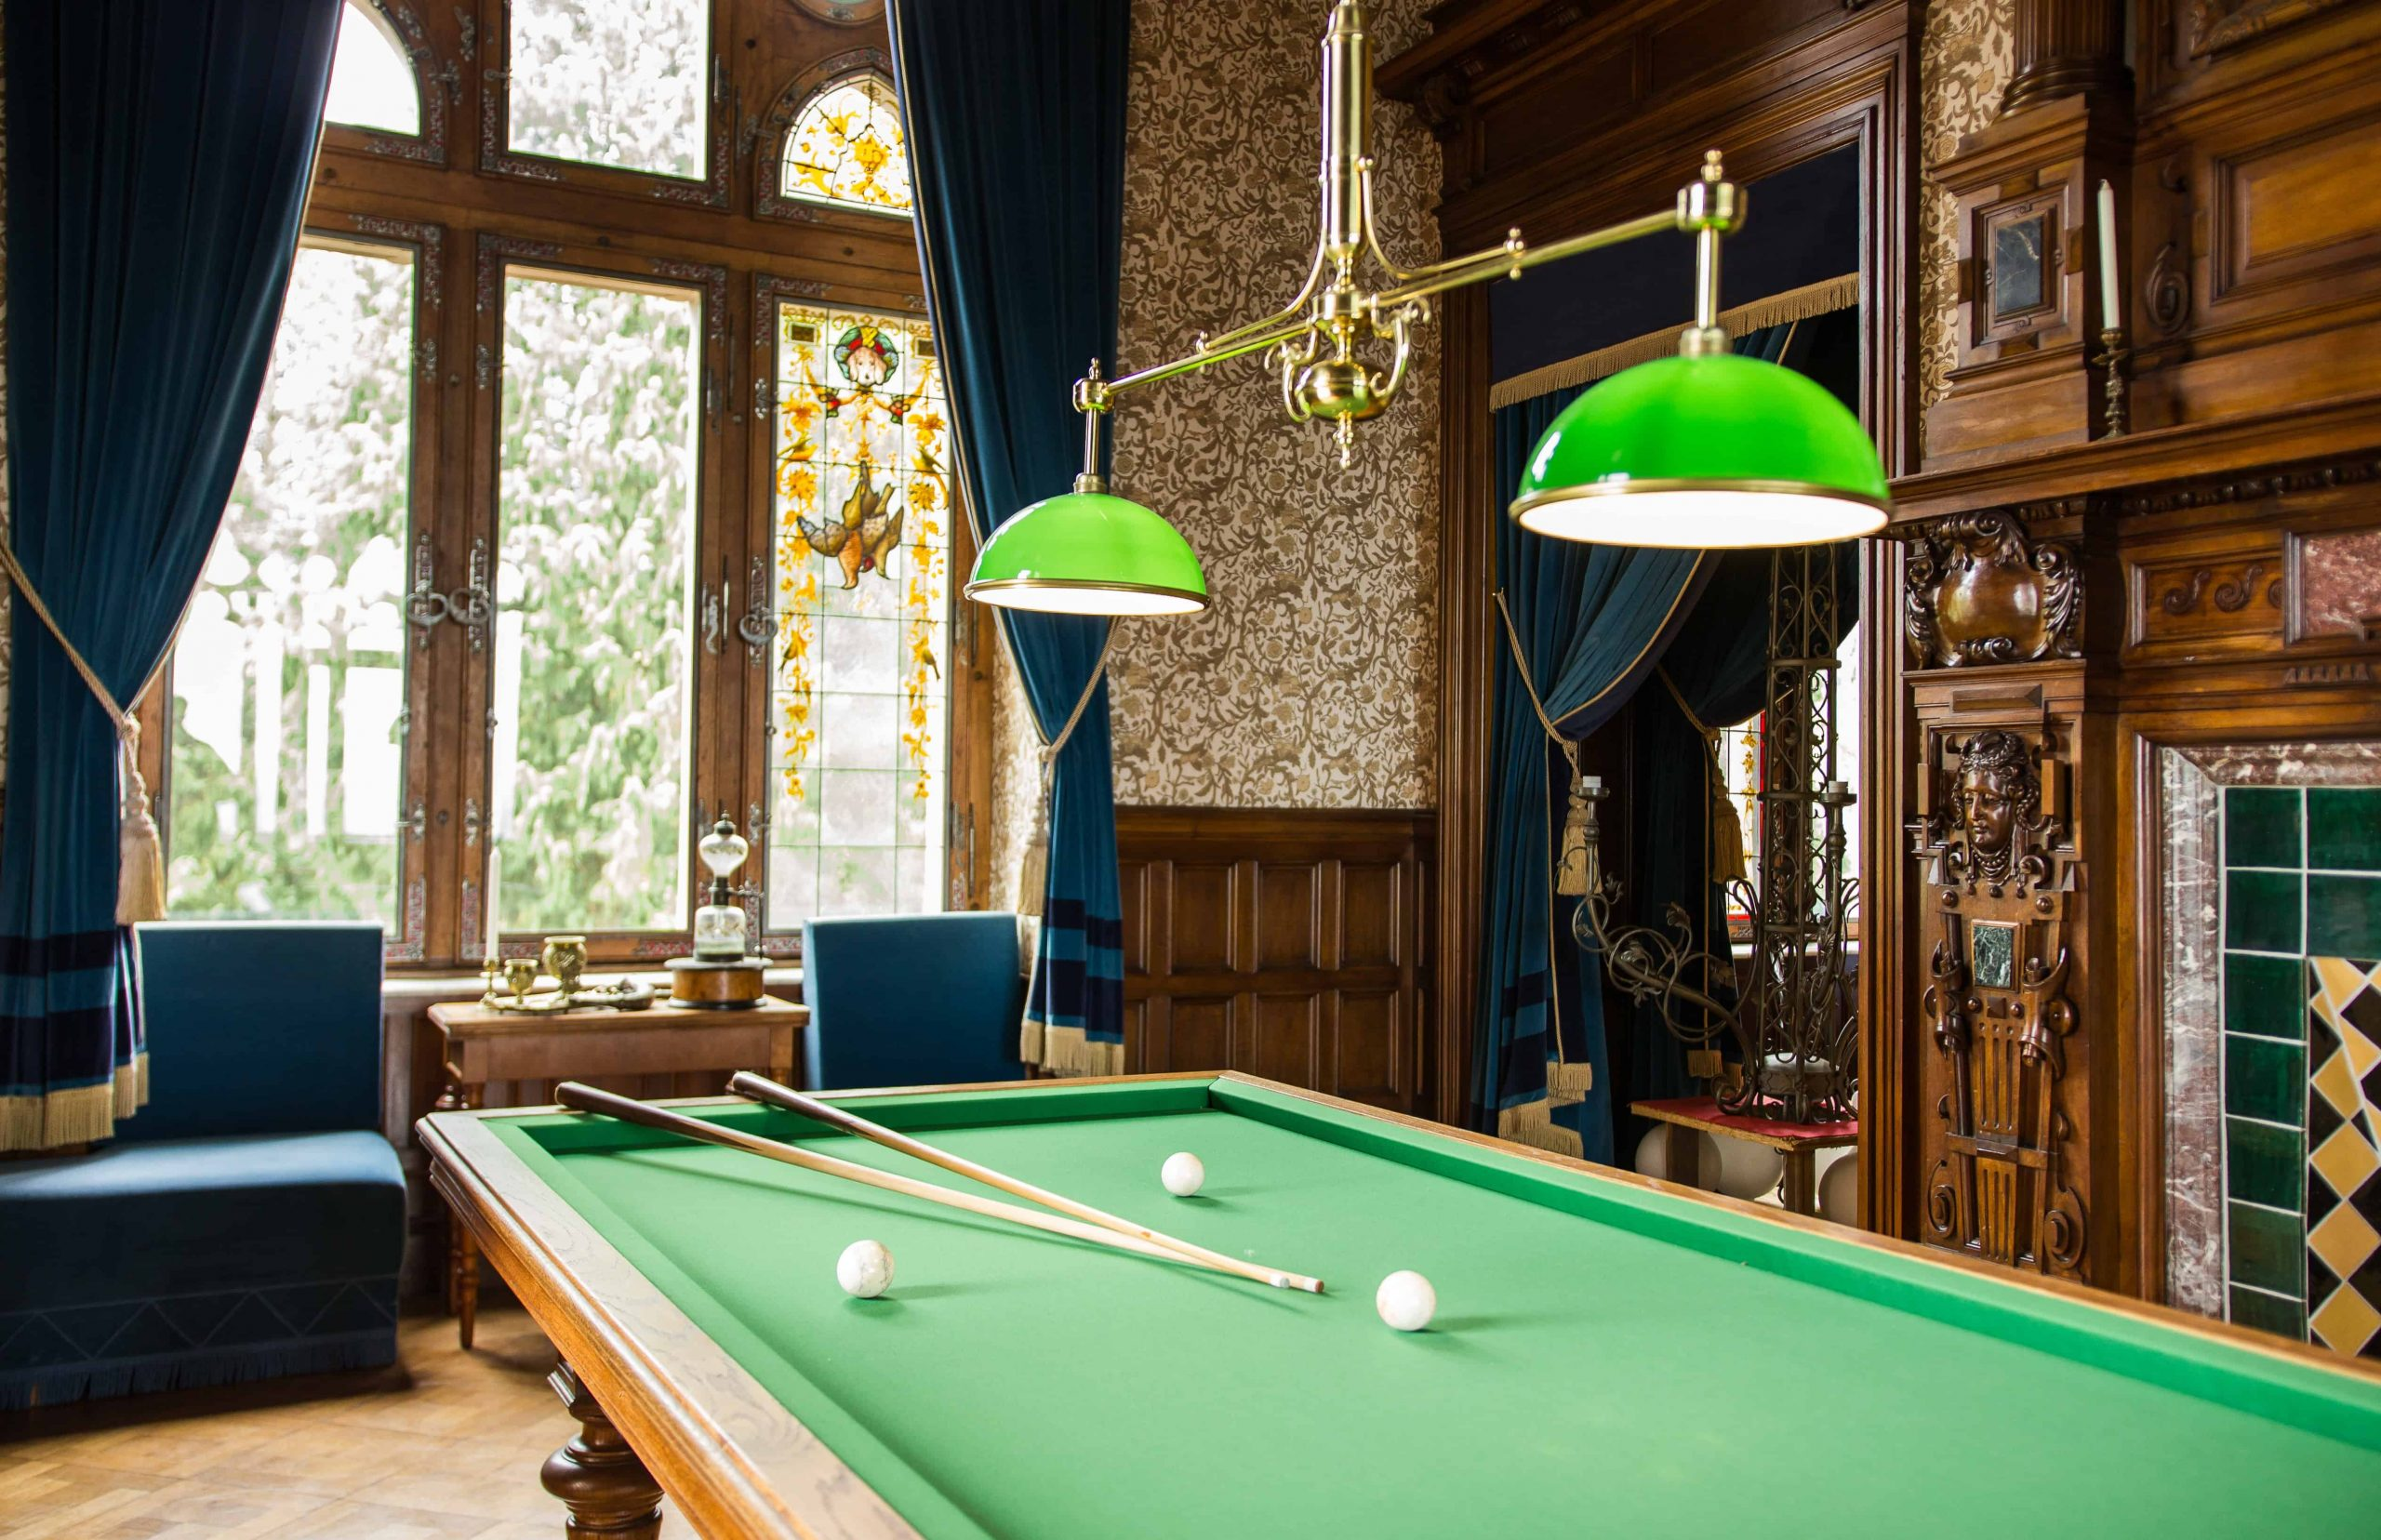 Pool Table Dimension